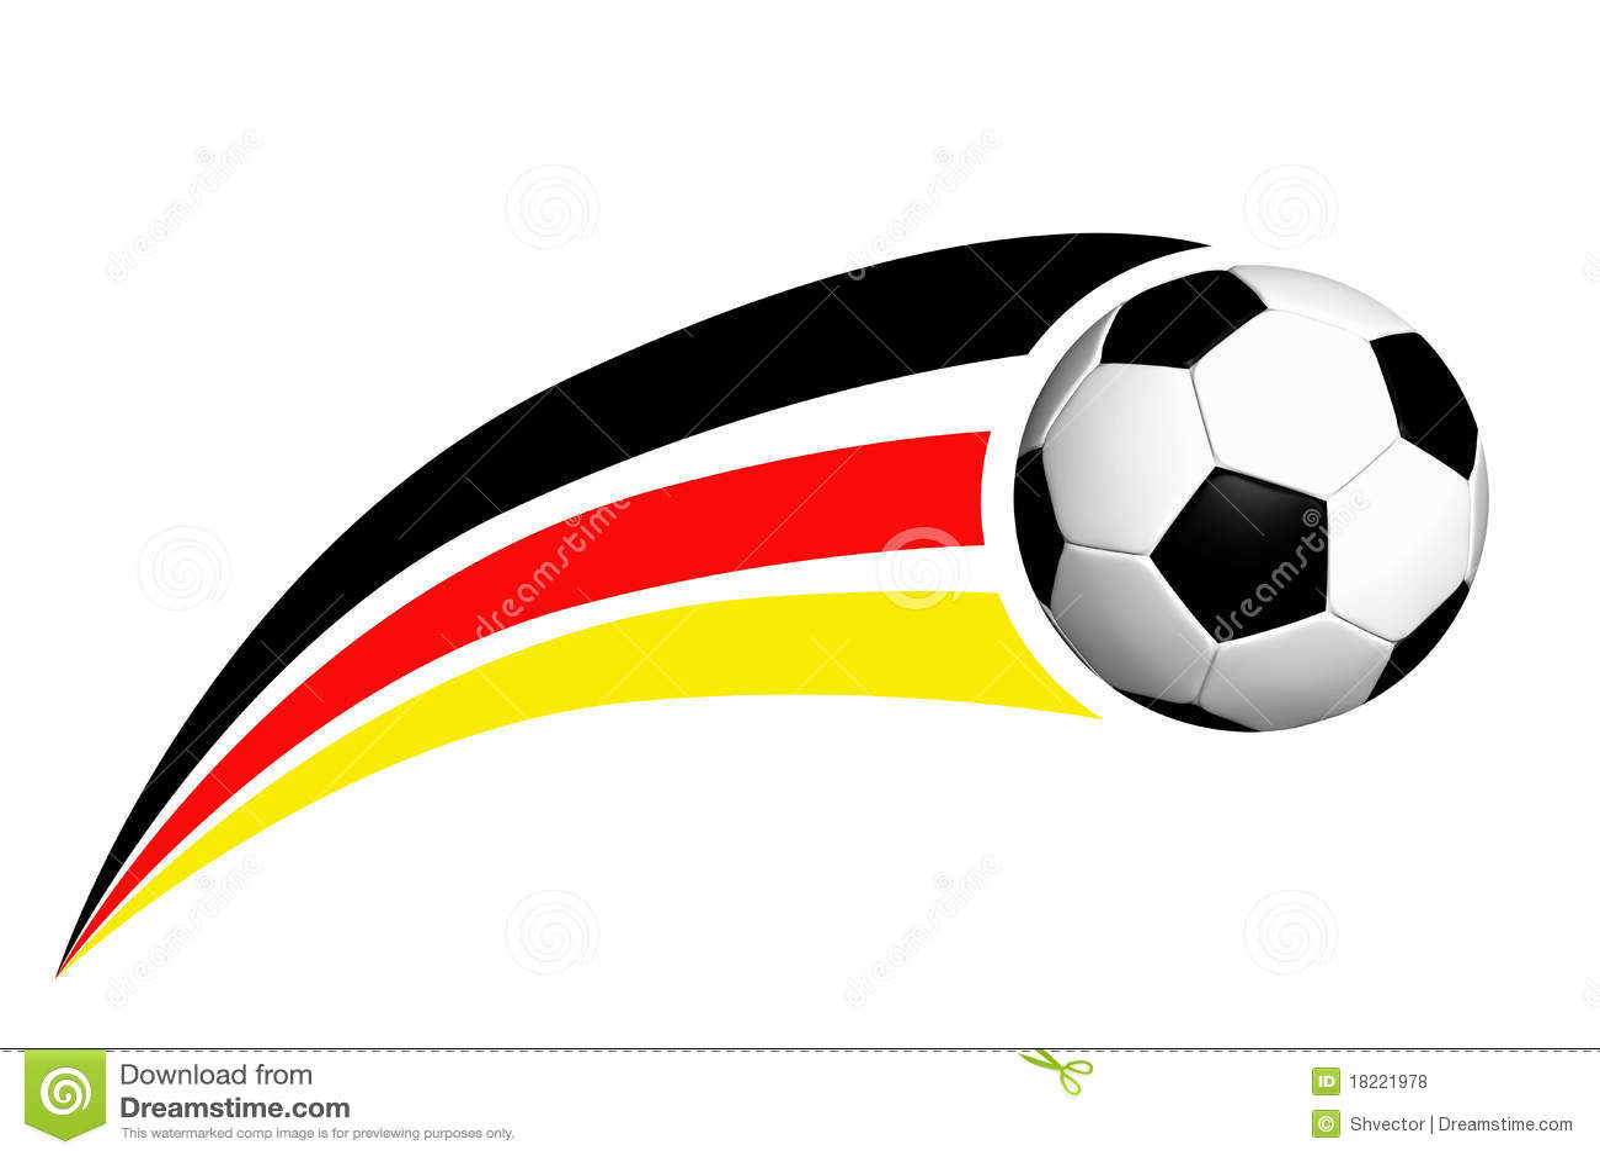 Germany Football Logo Images, Stock Photos & Vectors   Shutterstock